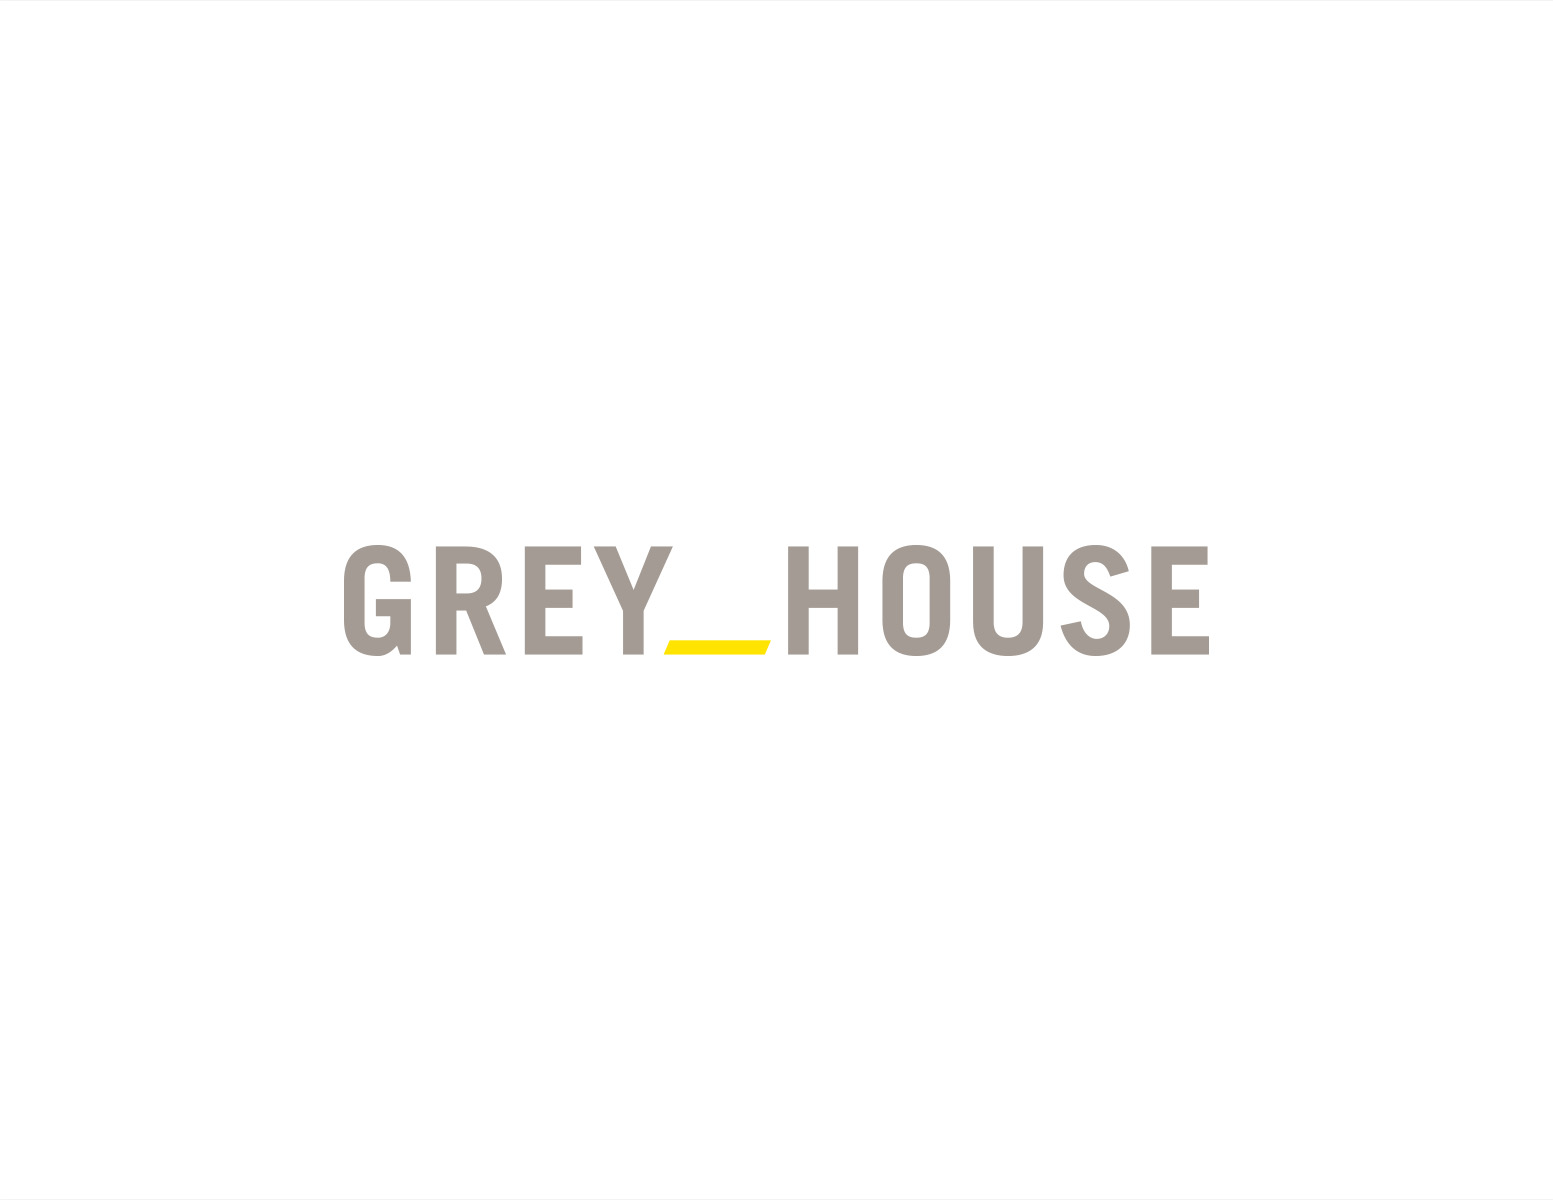 Grey_House_01.jpg